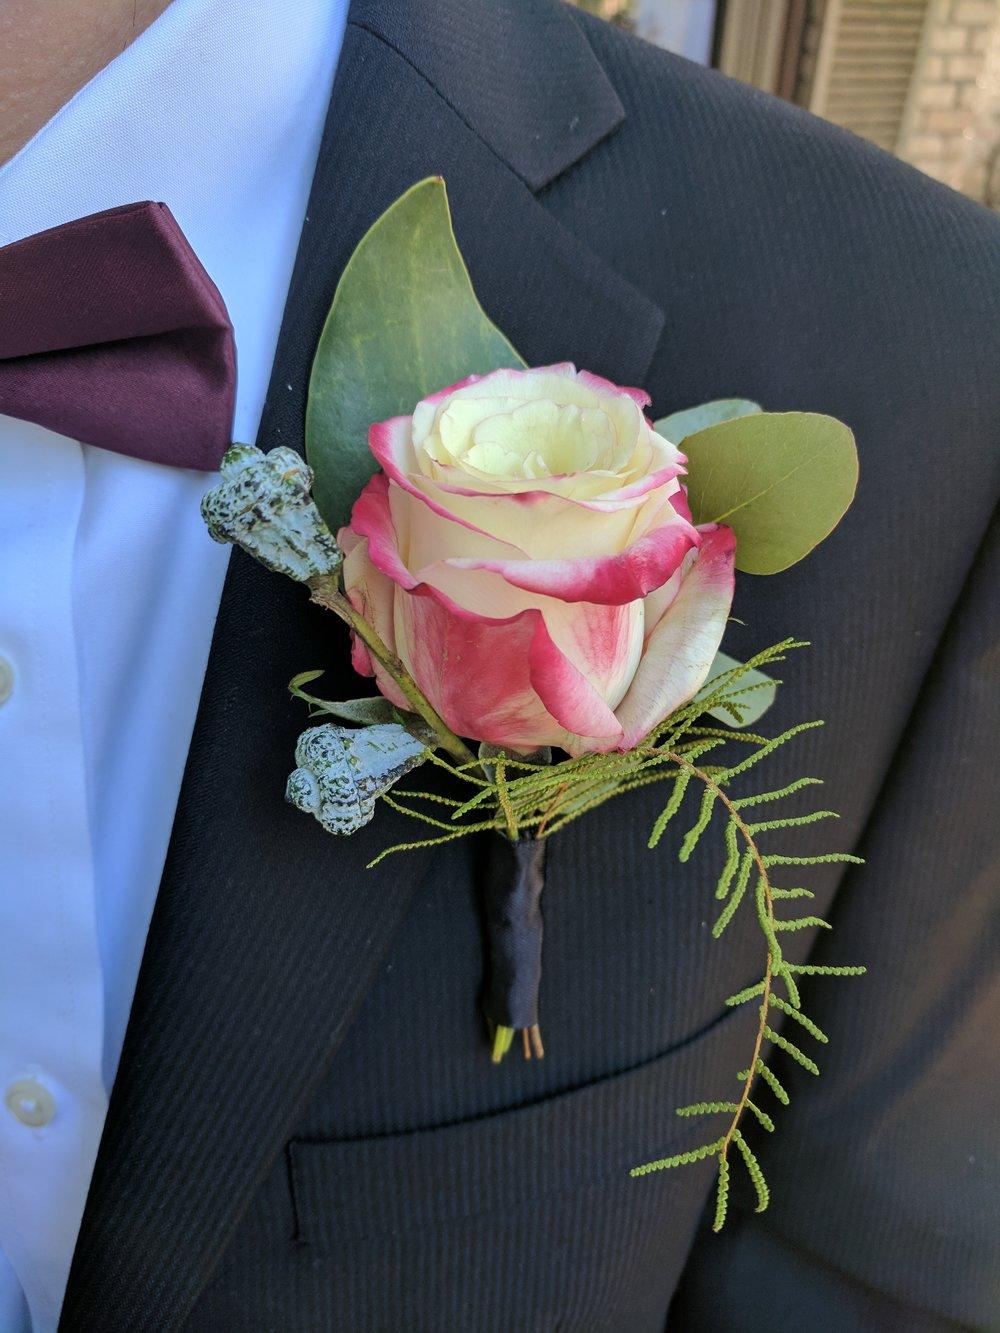 Sweetness Rose Boutonniere.jpg